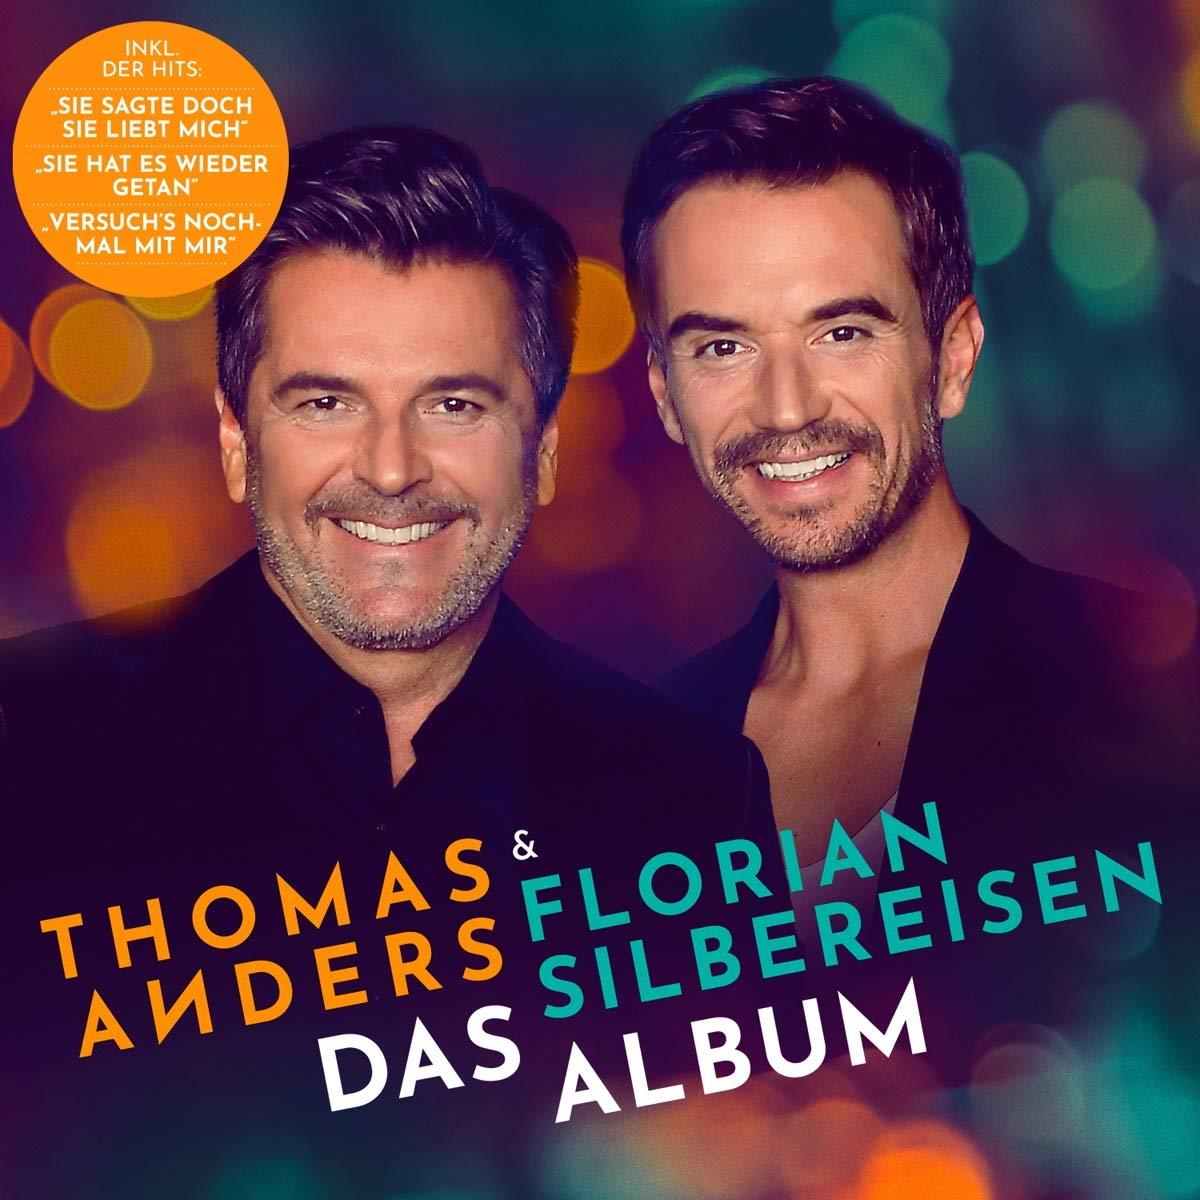 THOMAS ANDERS & FLORIAN SILBEREISEN * Das Album (CD) * Auch als \